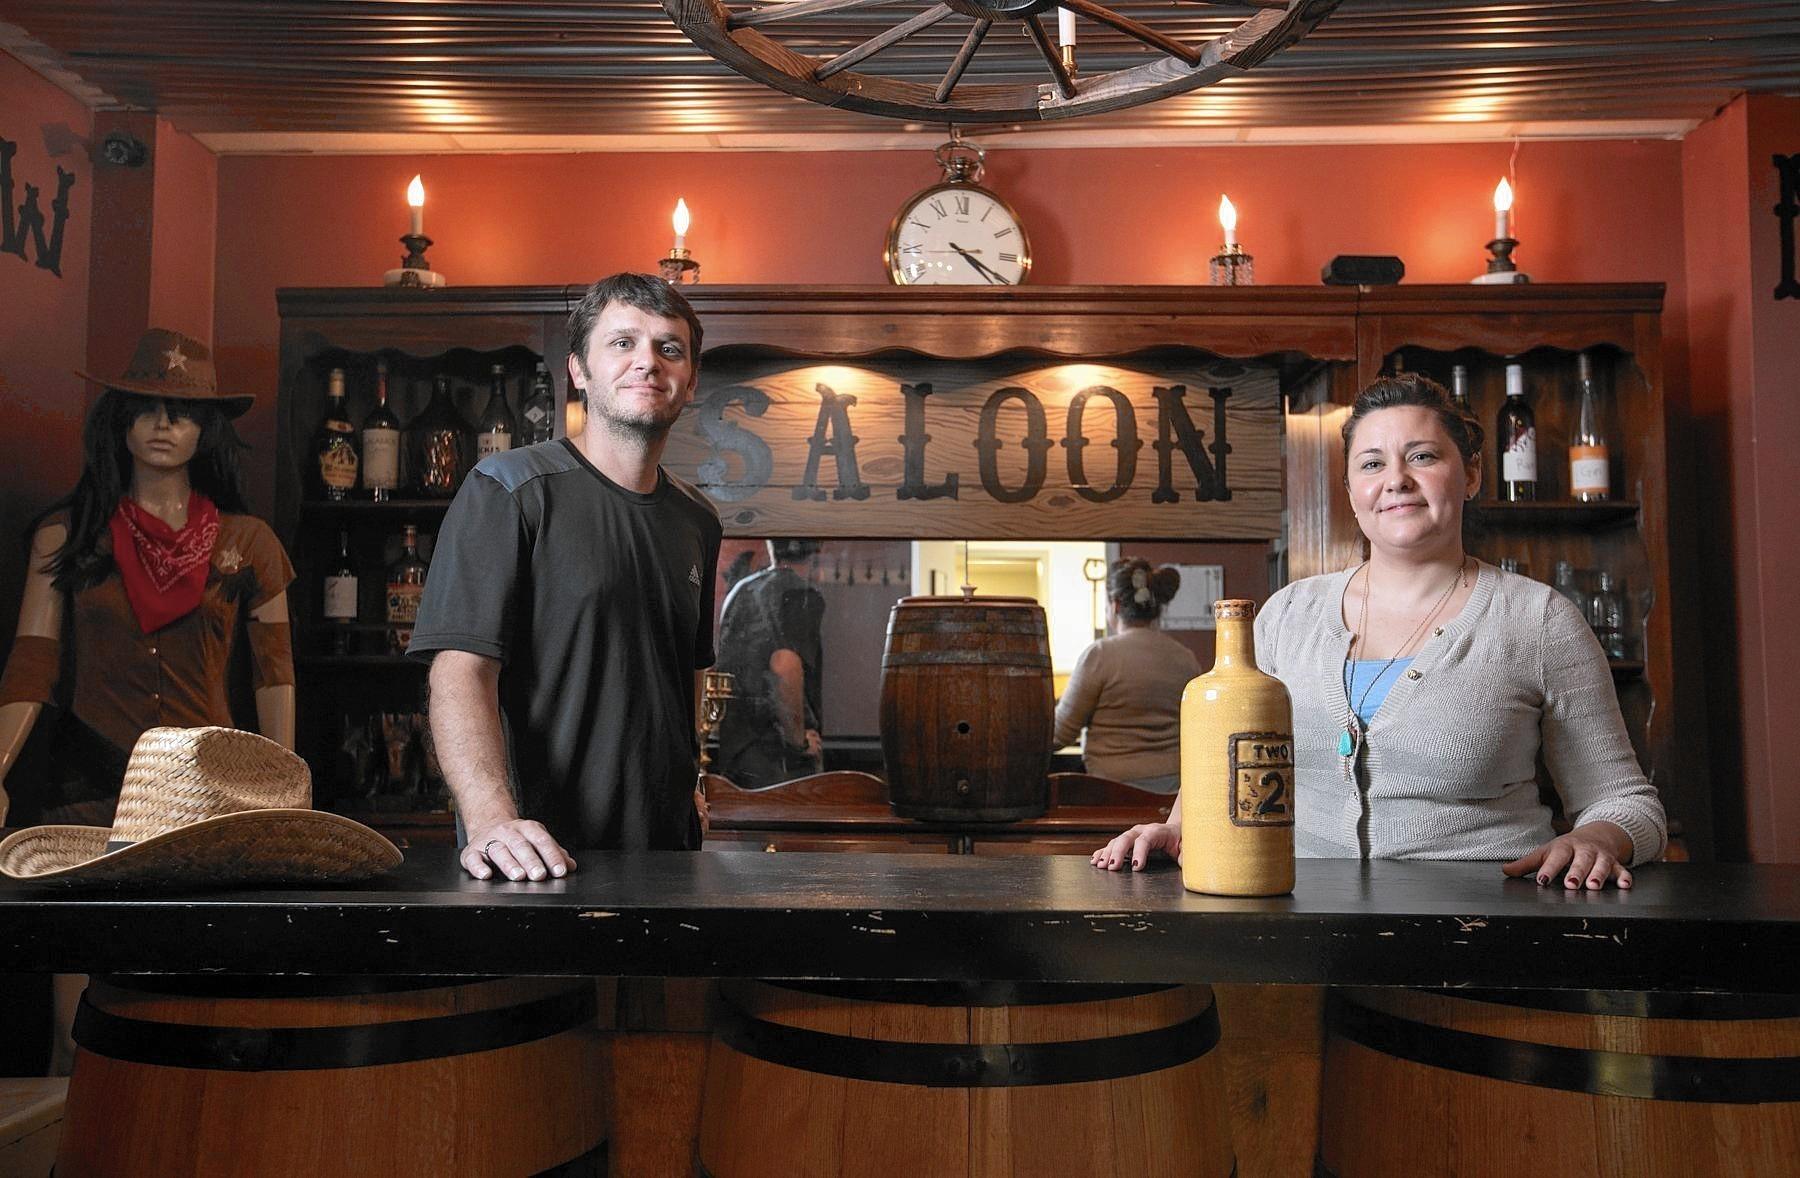 Escape Room Challenge Comes To Catonsville Baltimore Sun